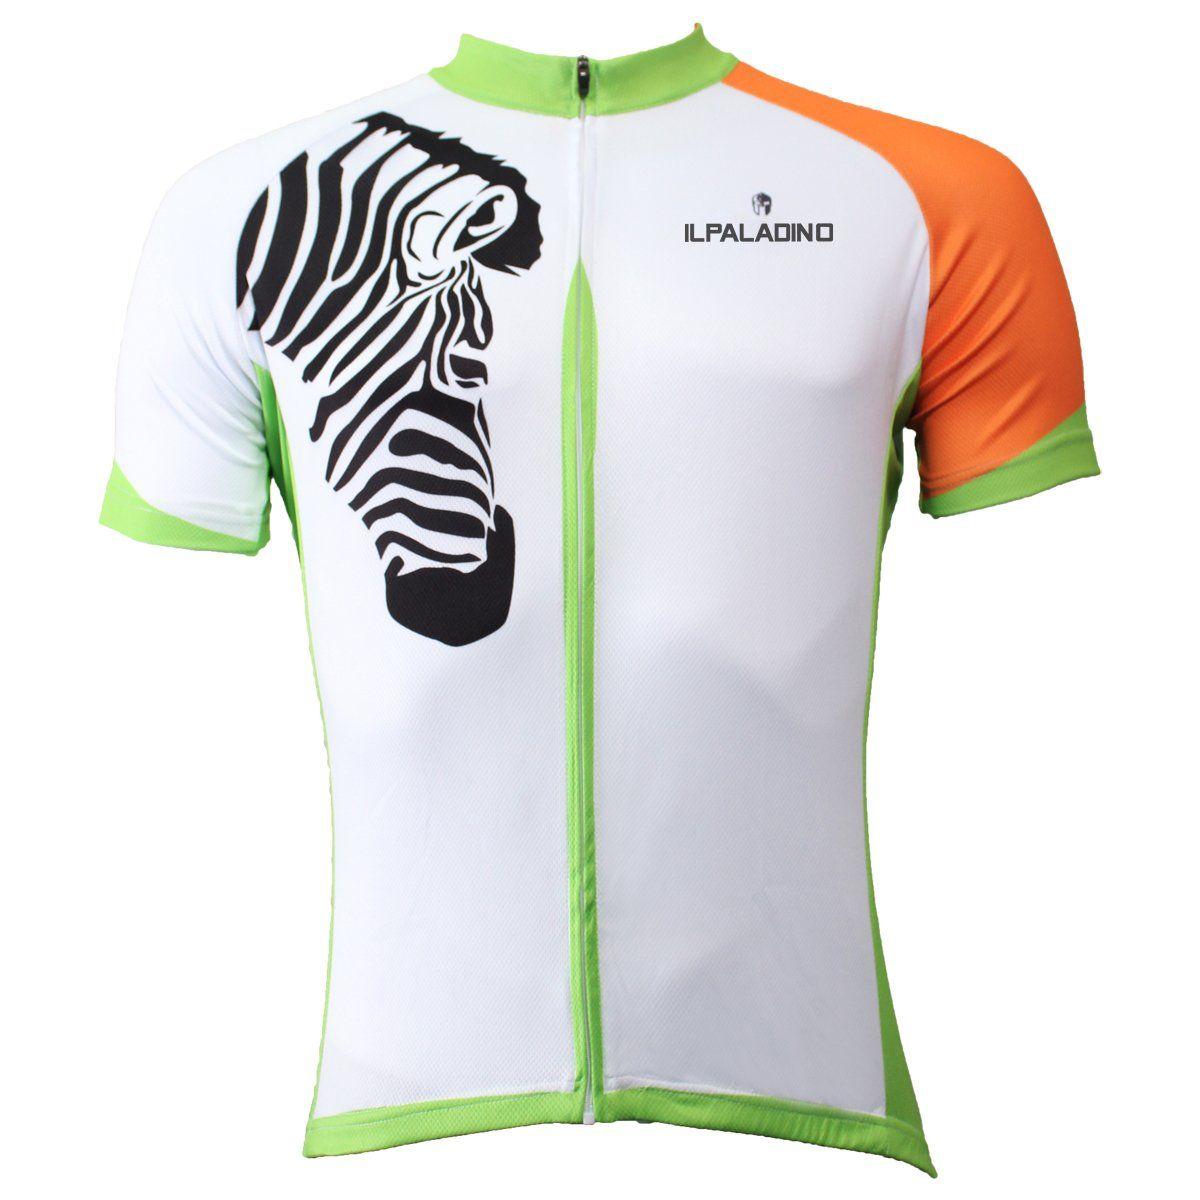 Ilpaladino Zebra Orange-arm Men s Breathable Short-Sleeve Cycling Jersey  Bicycling Shirts Summer Sportswear Apparel Outdoor Sports Leisure Biking  Shirt ... 1b0c5aa60